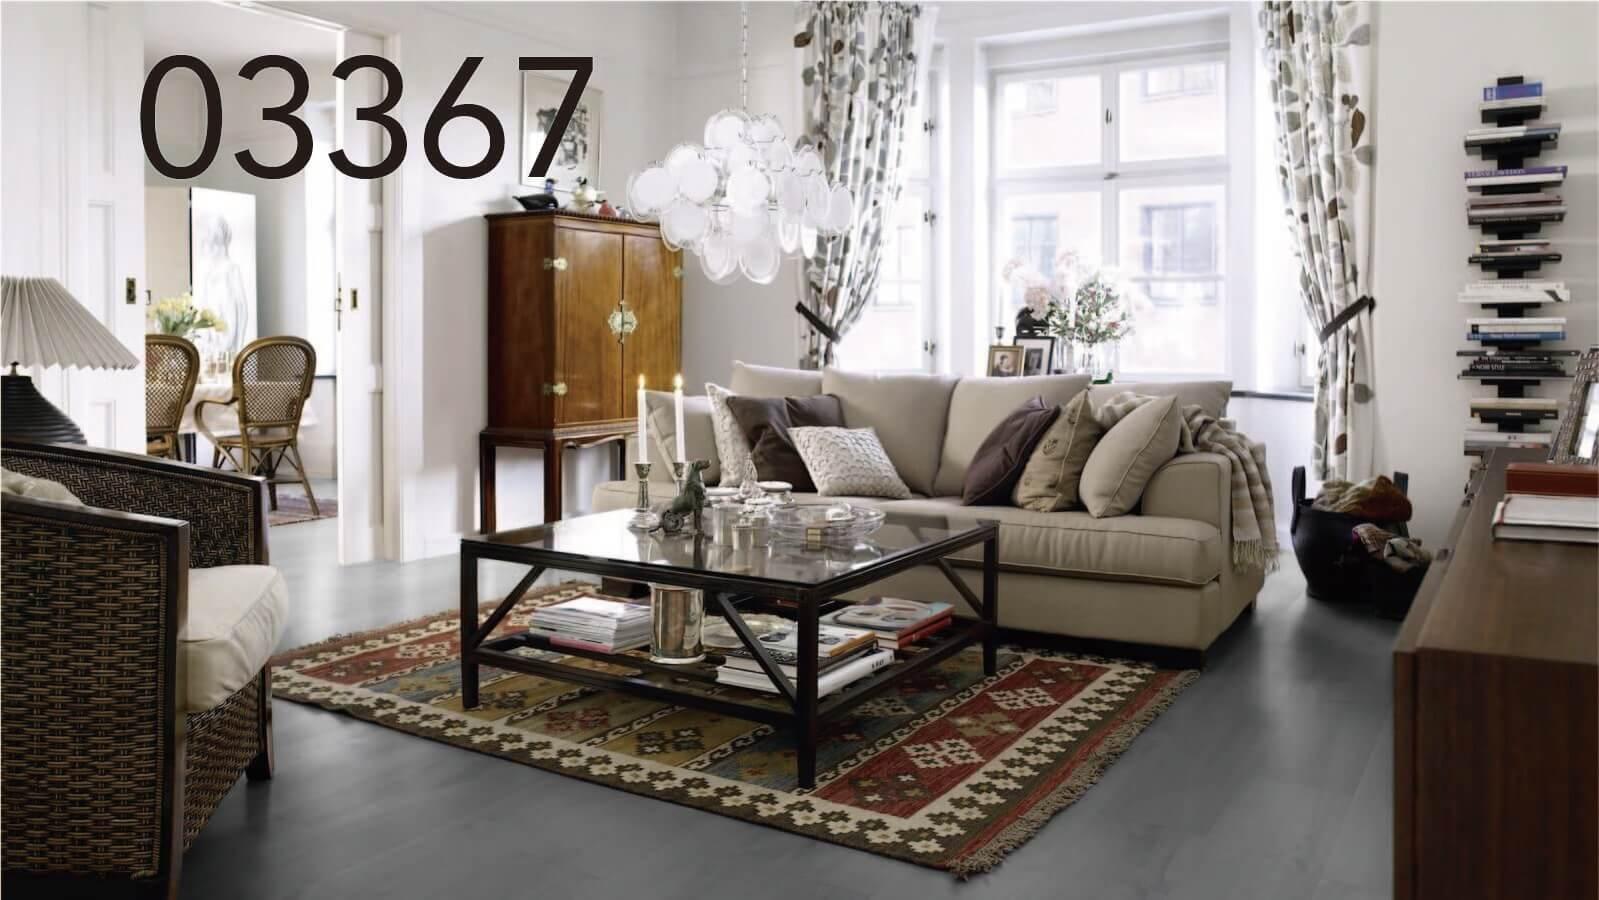 L0331-03367萊茵橡木